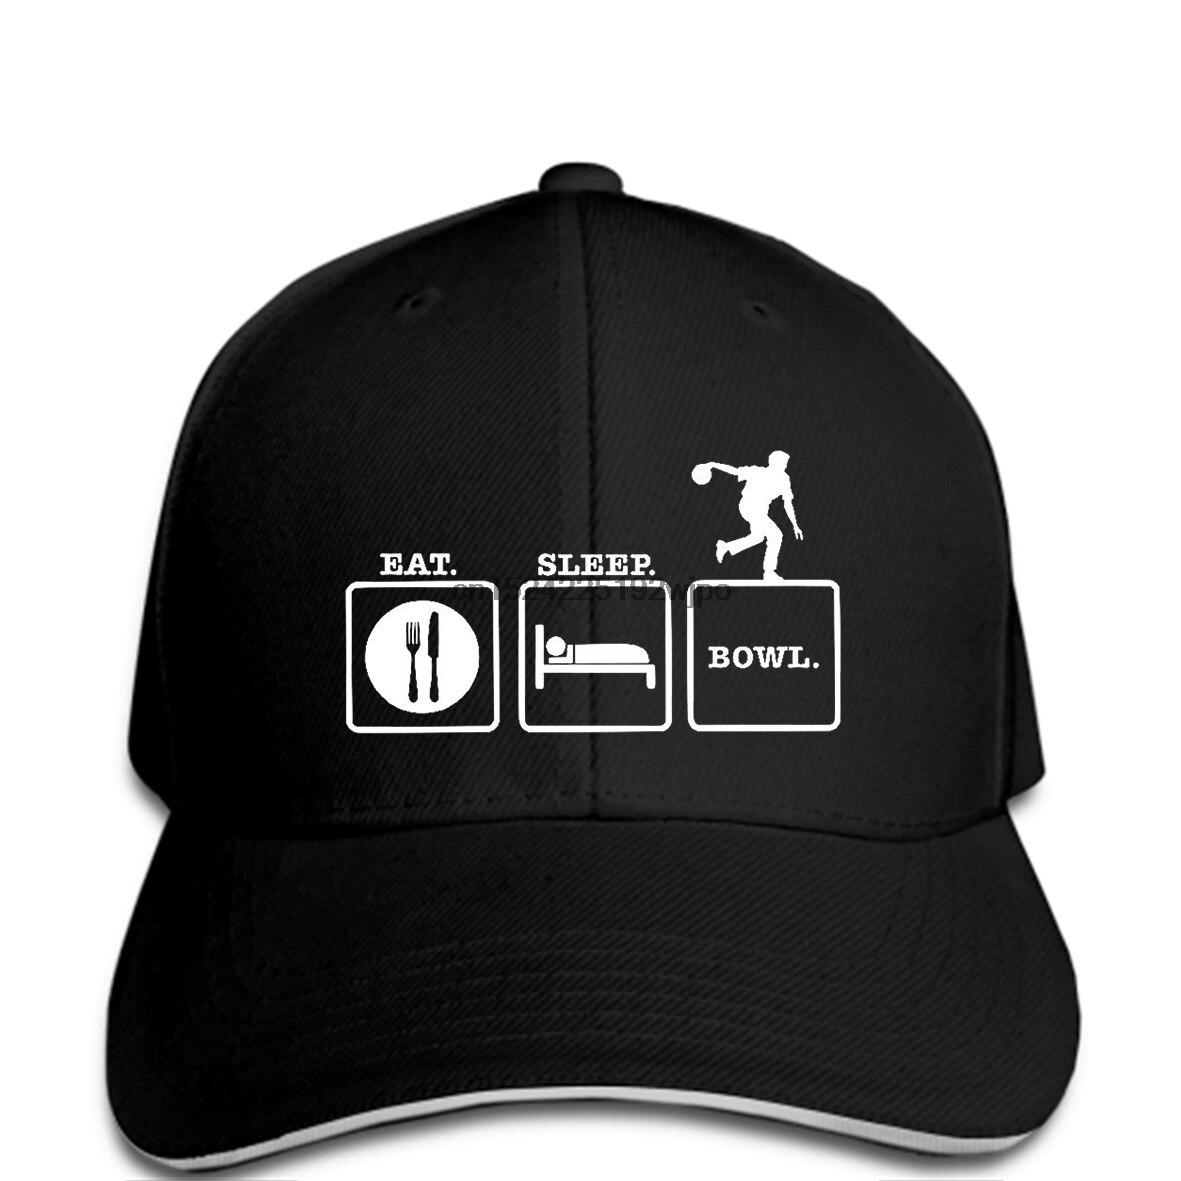 Official Website Eat Sleep Bowl Cap Bowlinger Bowlser Strike Pin Funny Birthday Gift 123t Metal Print Baseball Cap Men Factories And Mines Men's Hats